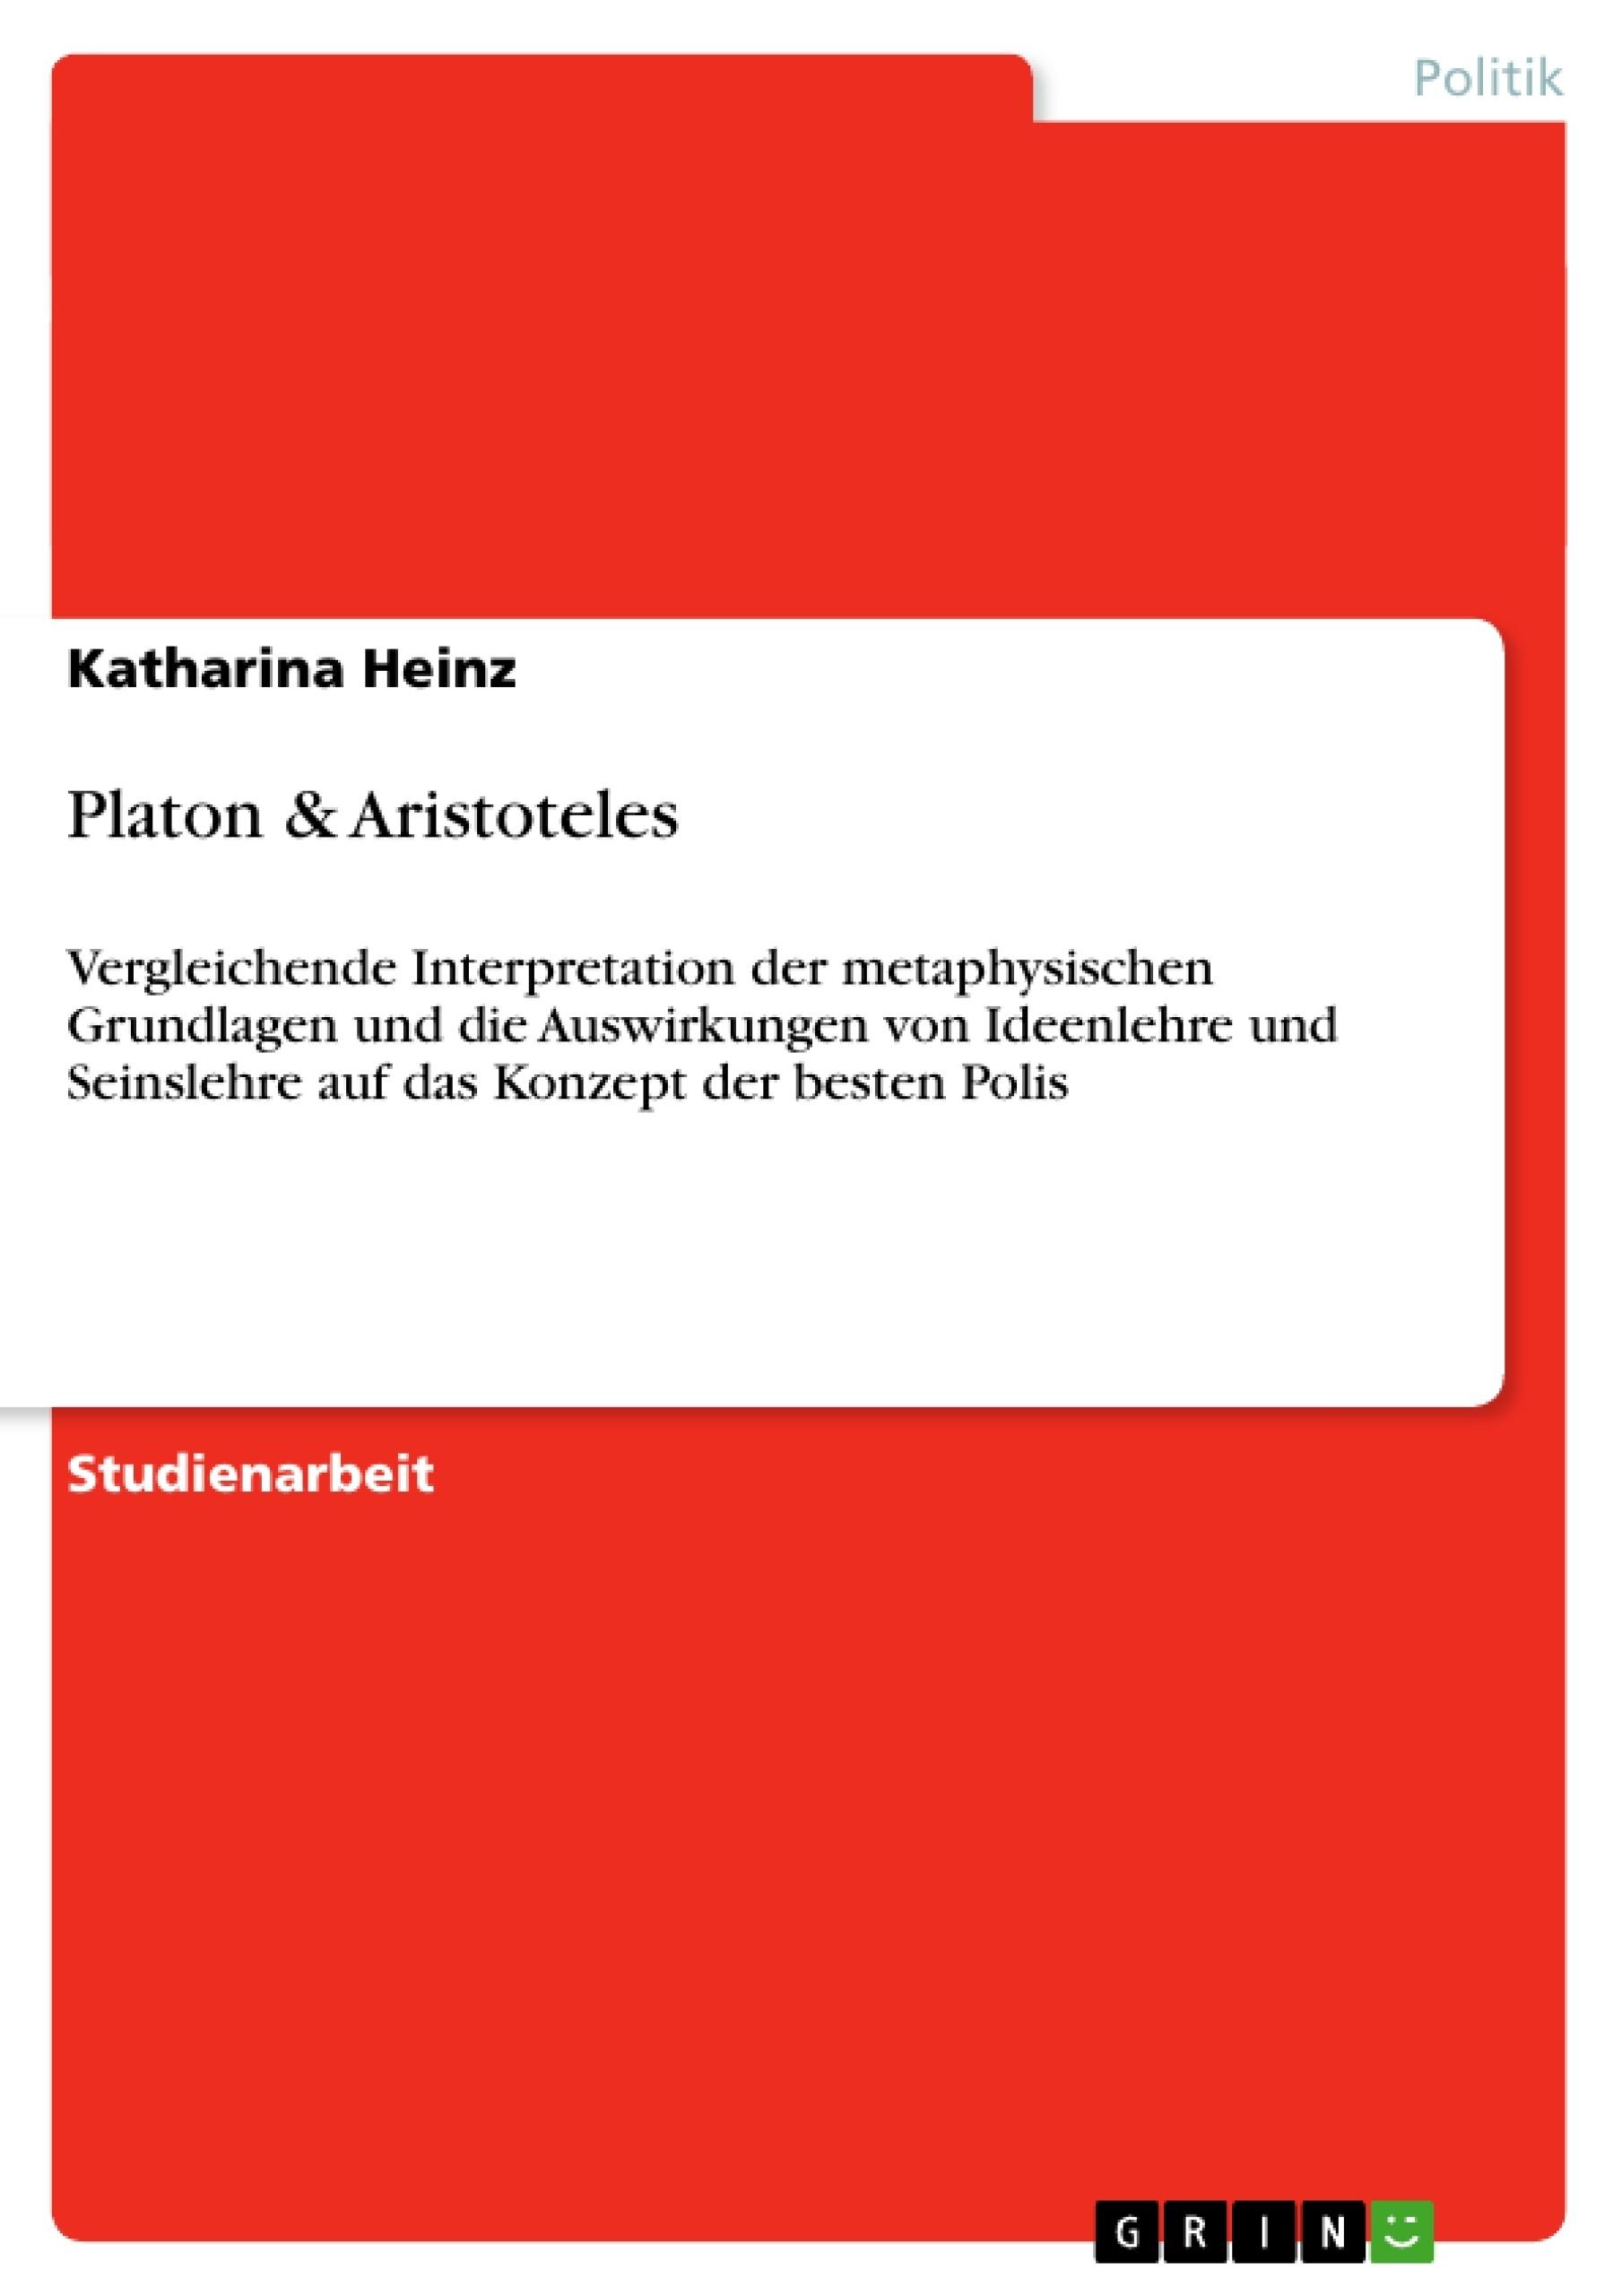 Titel: Platon & Aristoteles